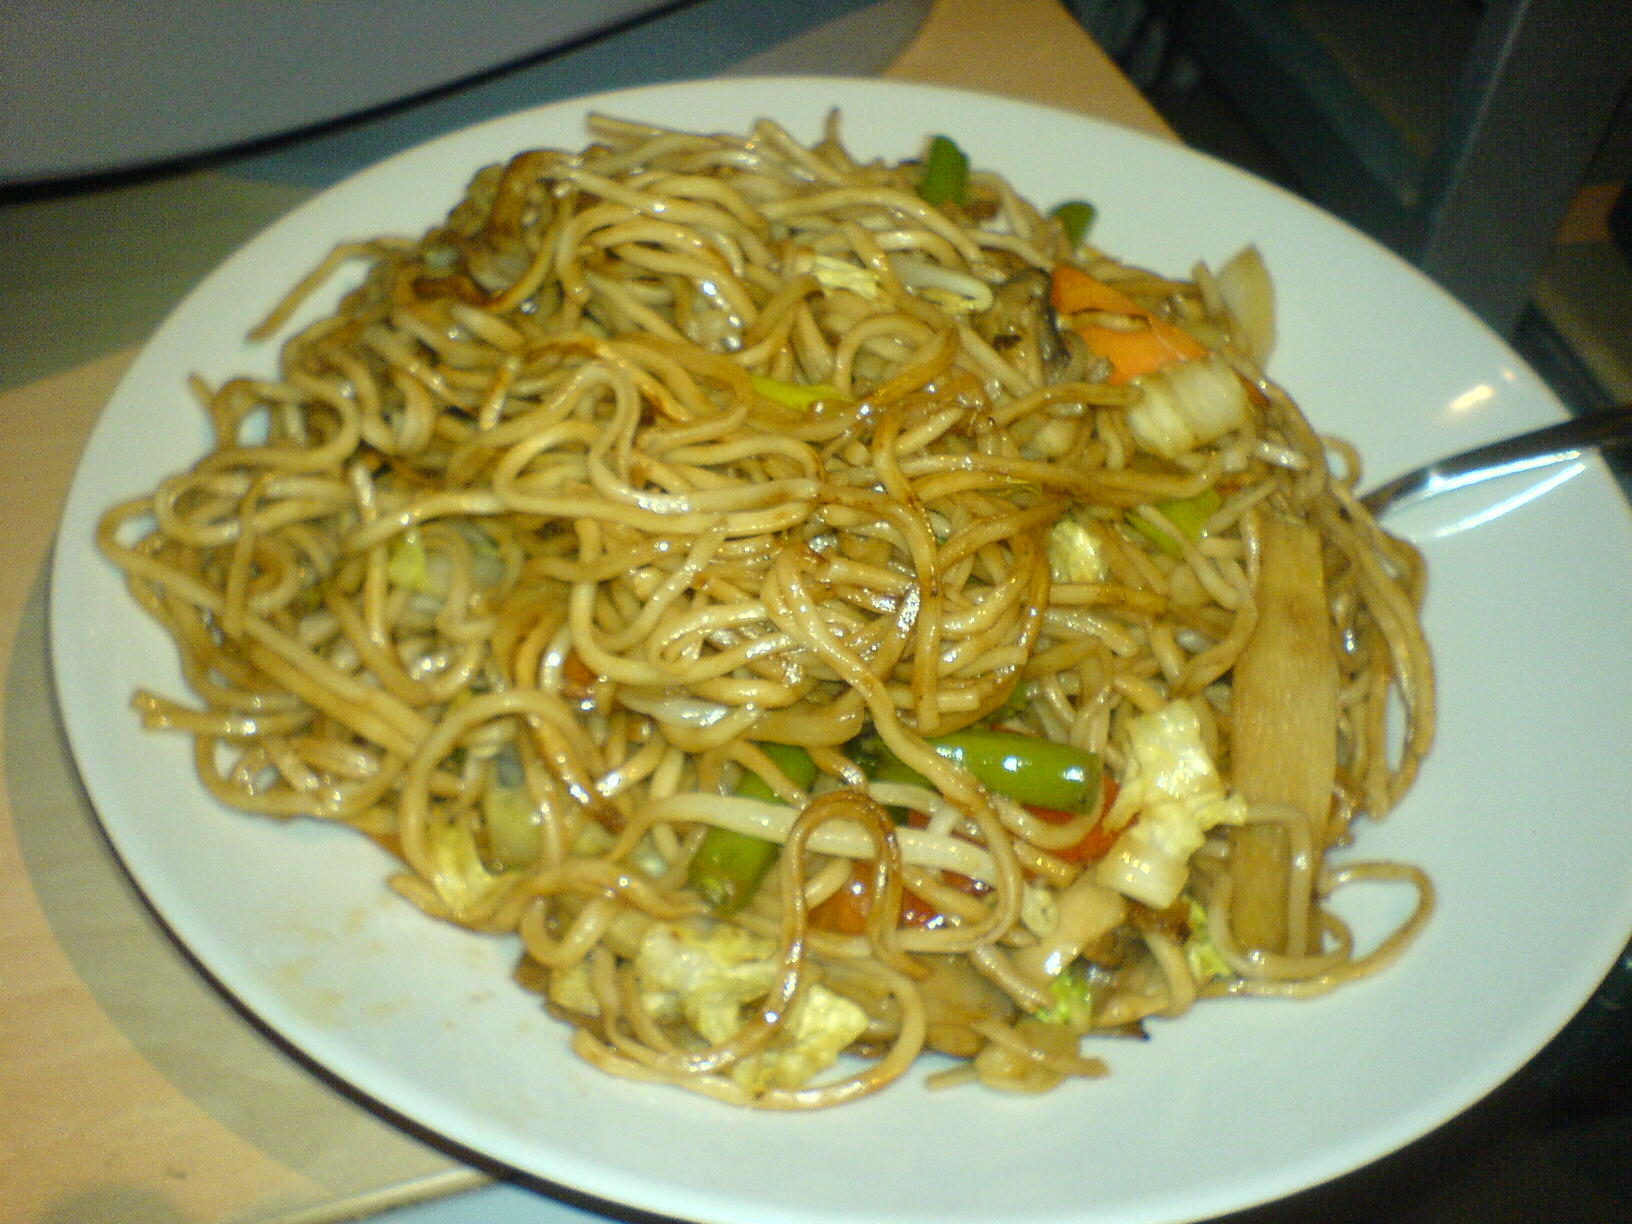 http://foodloader.net/Holz_2009-02-12_Asianudeln.jpg